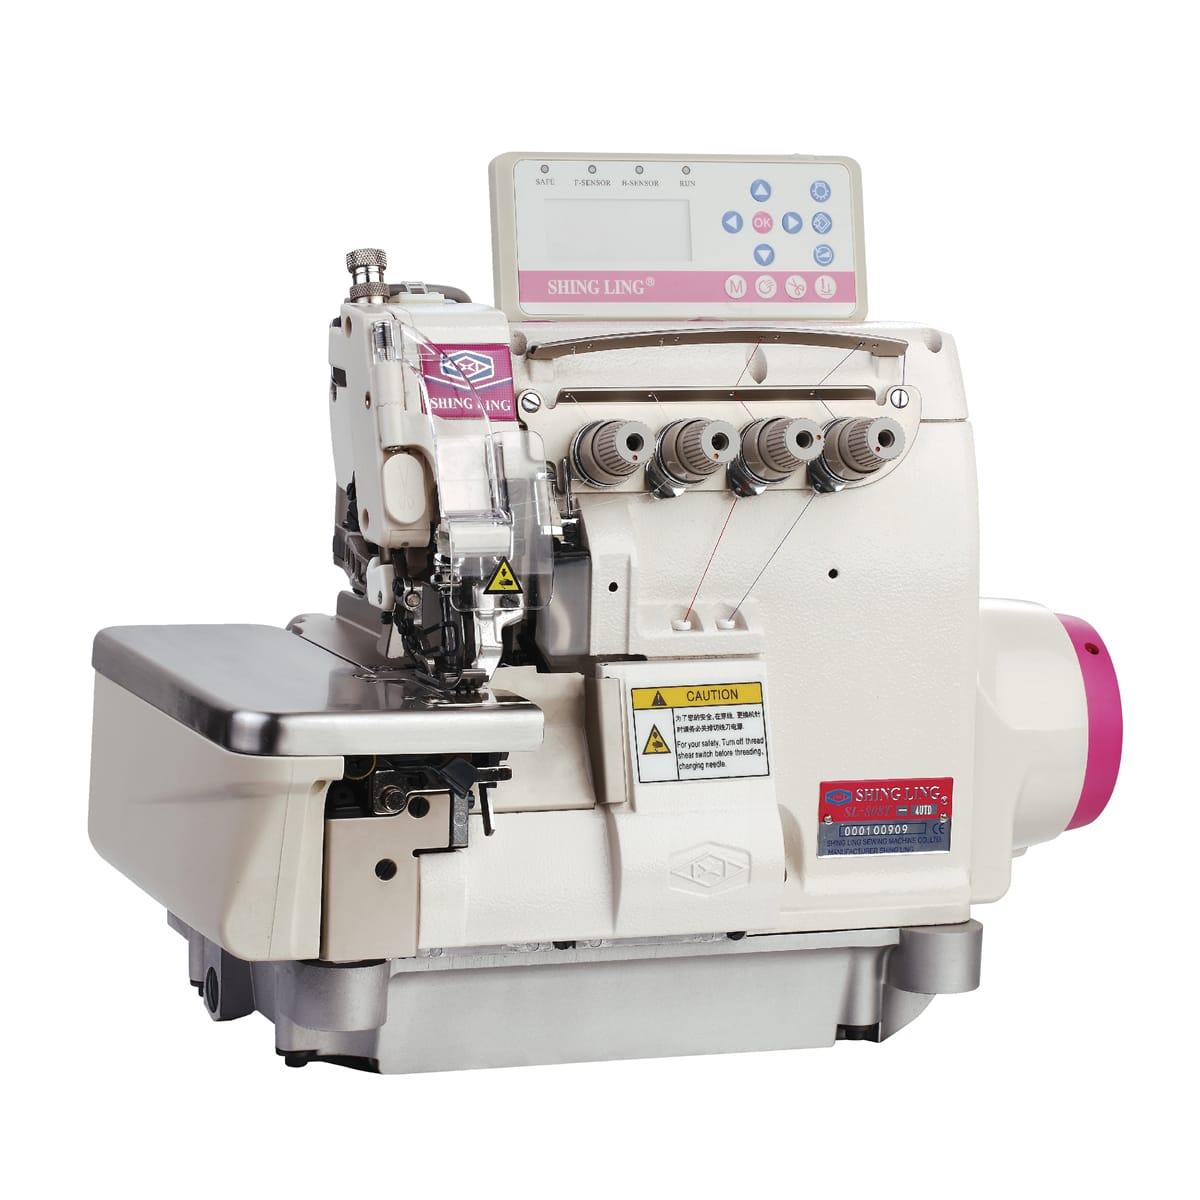 SL-898 Series